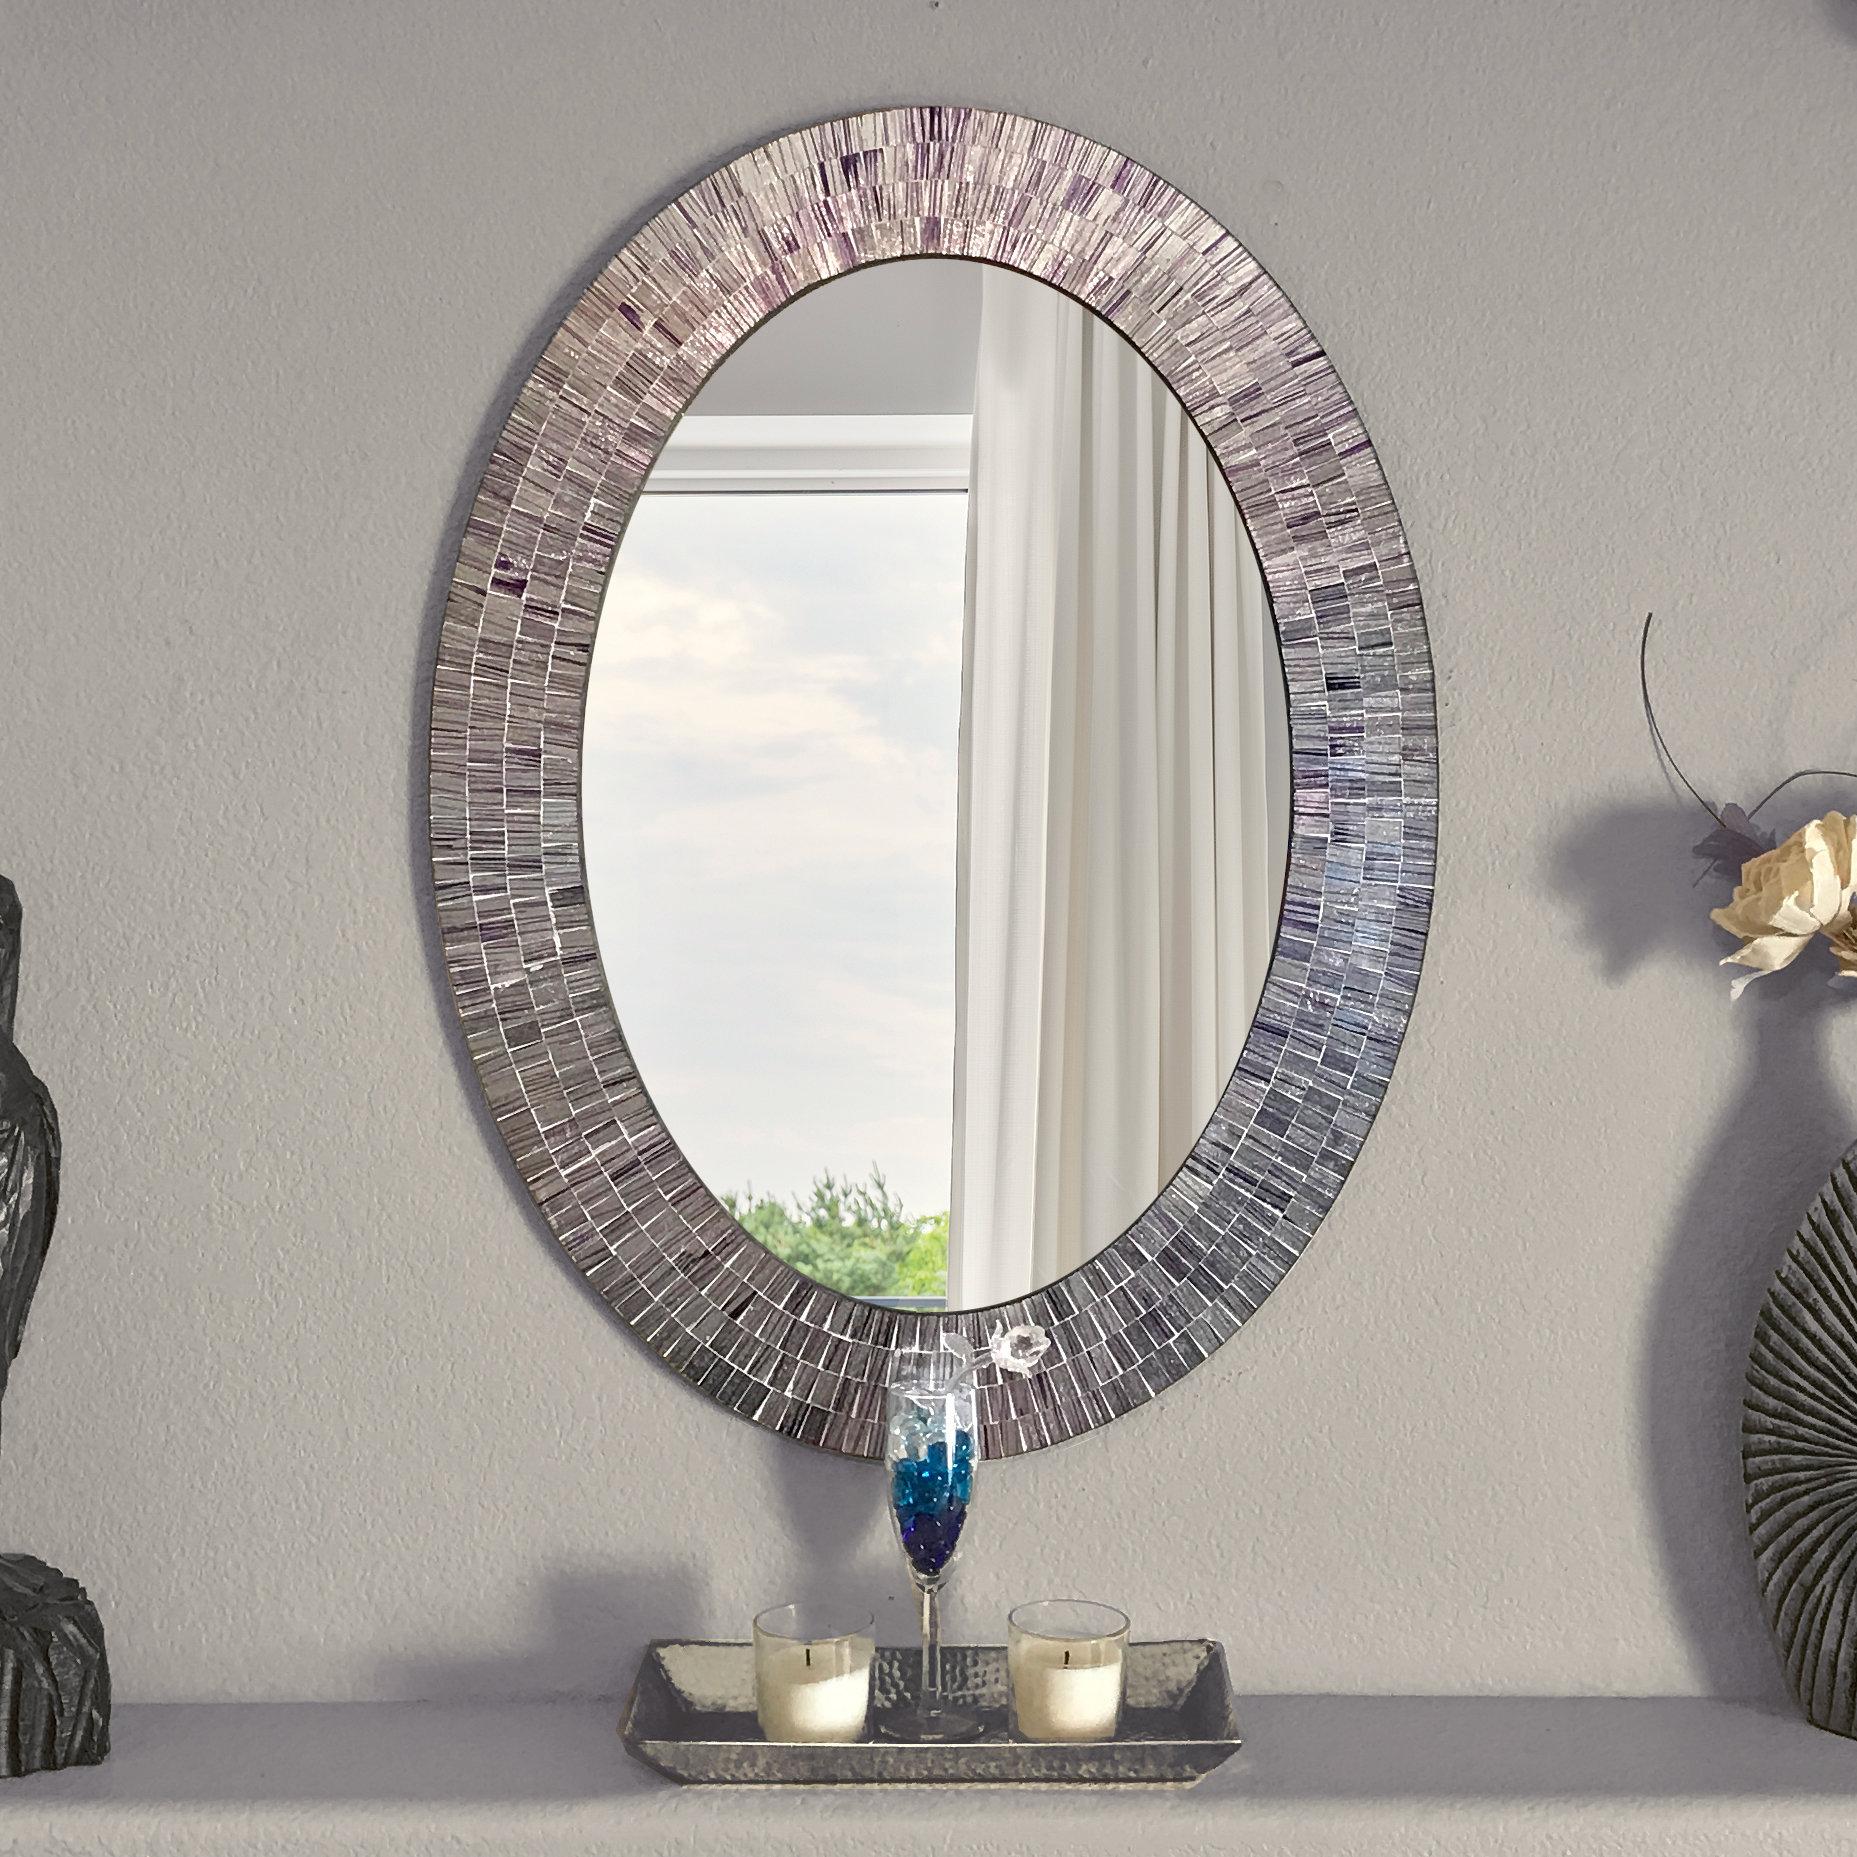 Mckim Wall Mounted Mirror In Sajish Oval Crystal Wall Mirrors (View 12 of 20)